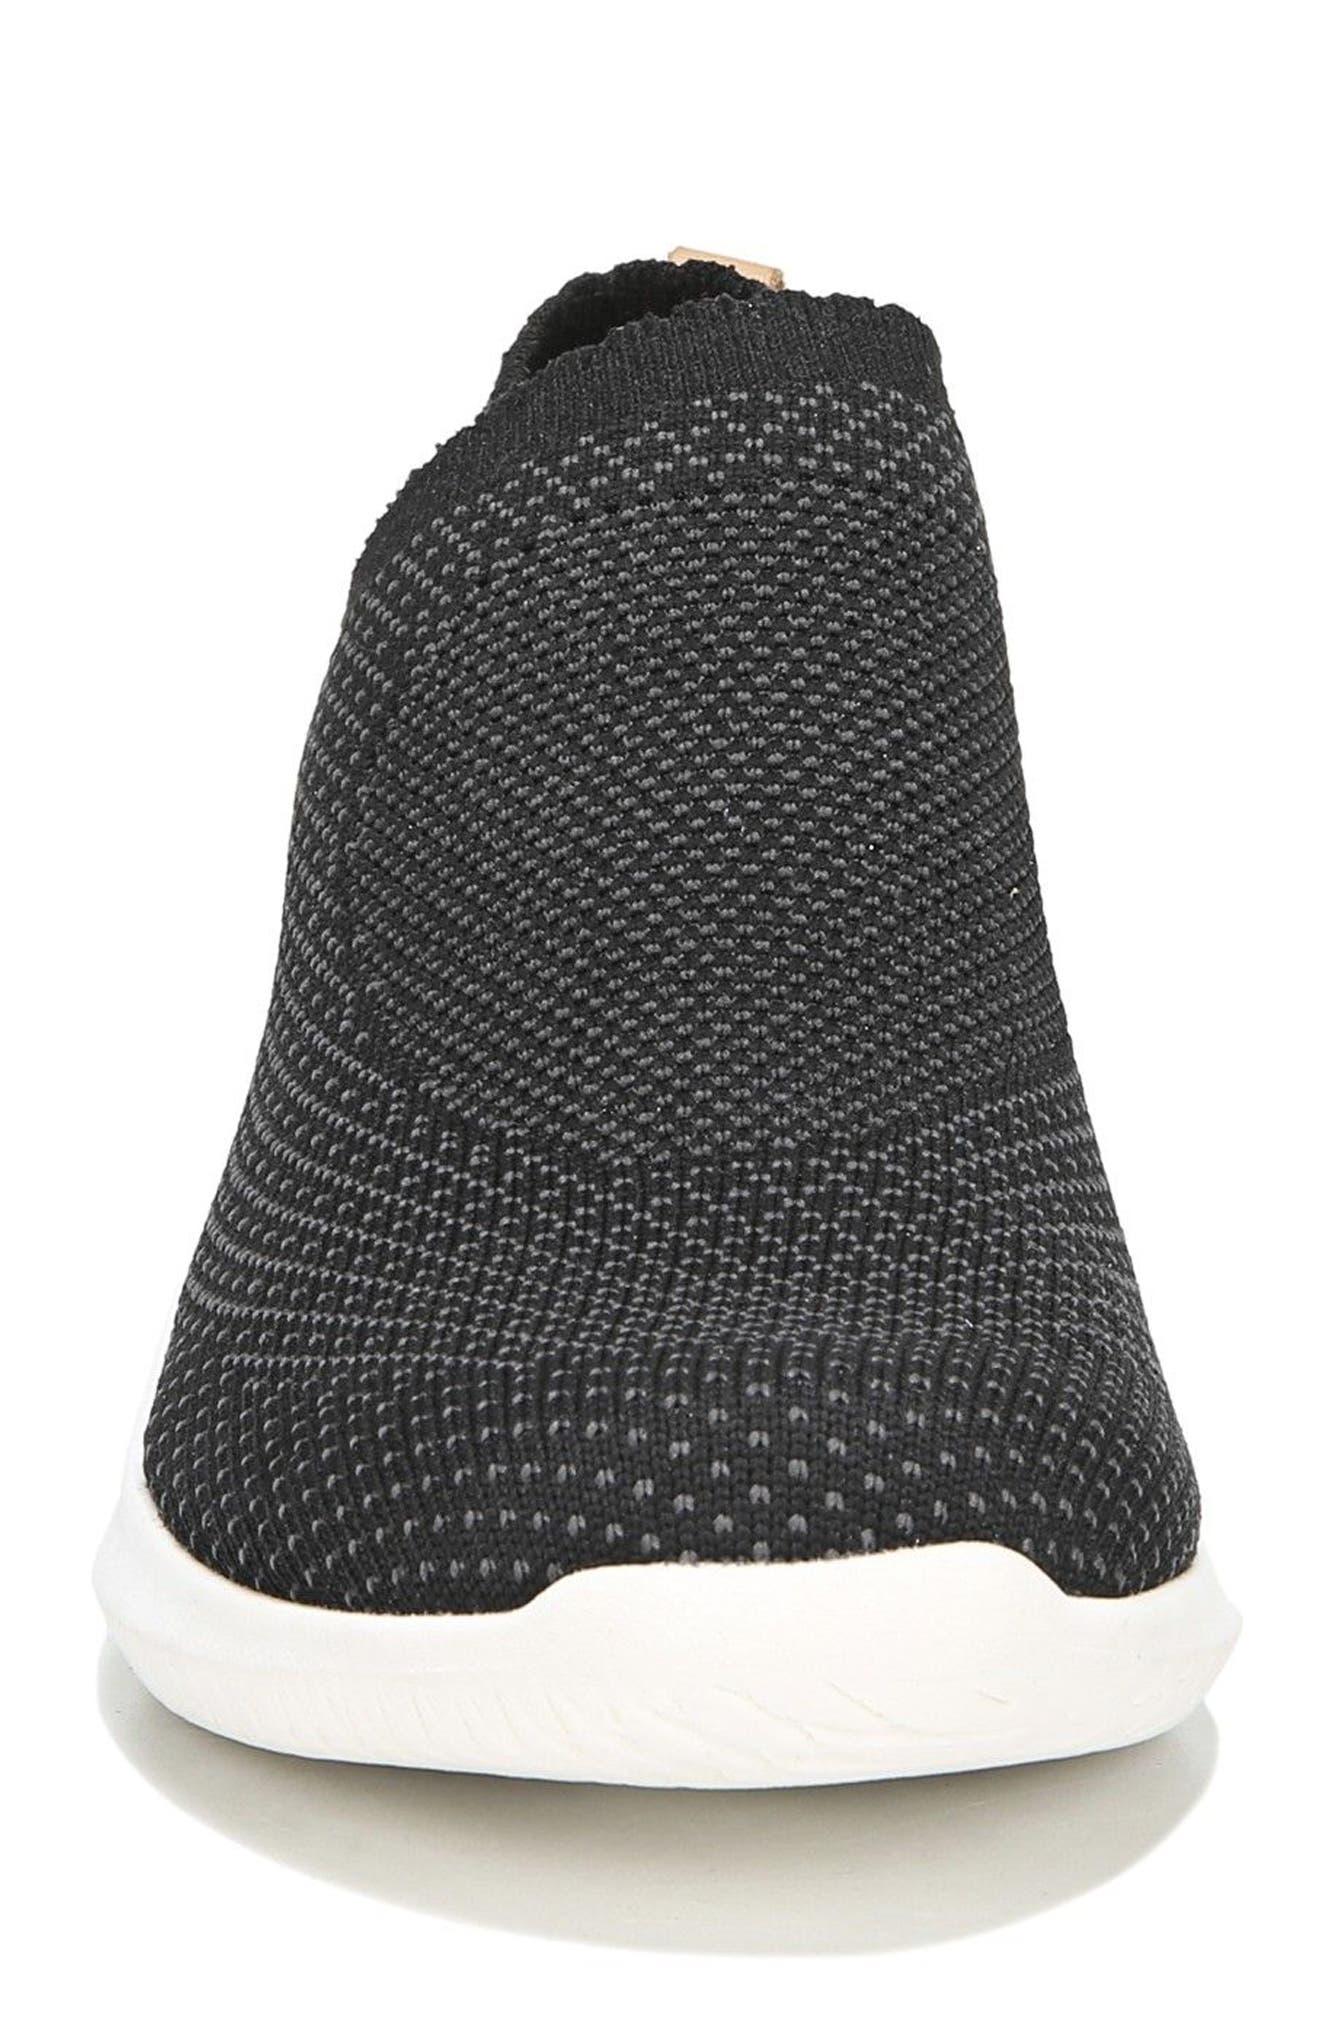 Fierce Knit Slip-On Sneaker,                             Alternate thumbnail 4, color,                             BLACK KNIT FABRIC